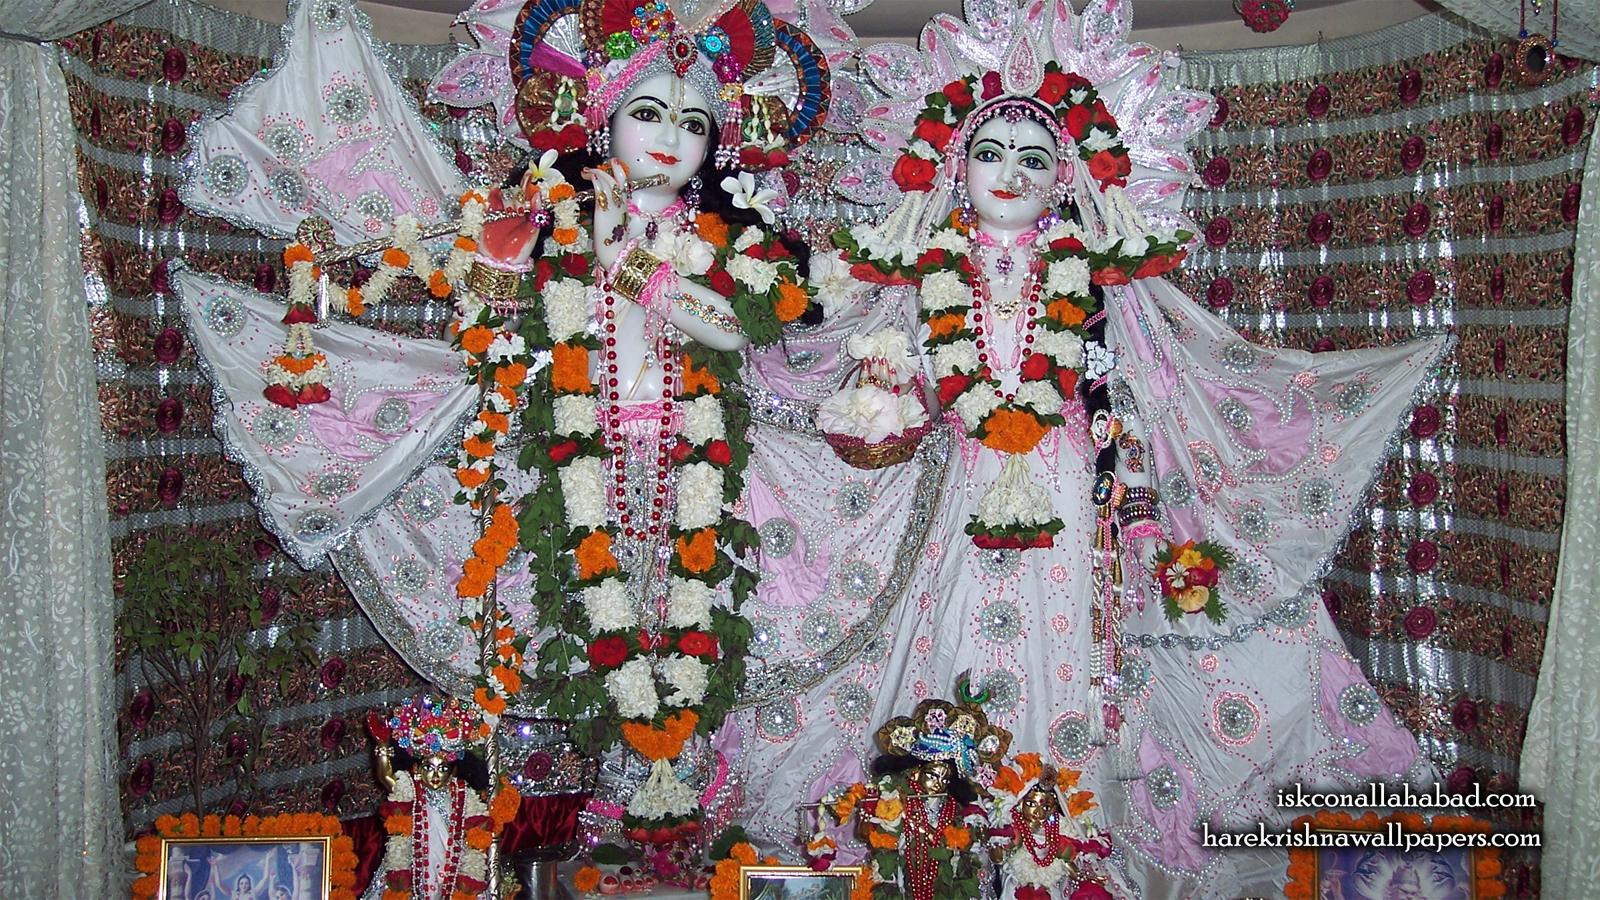 Sri Sri Radha Venimadhava Wallpaper (002) Size 1600x900 Download